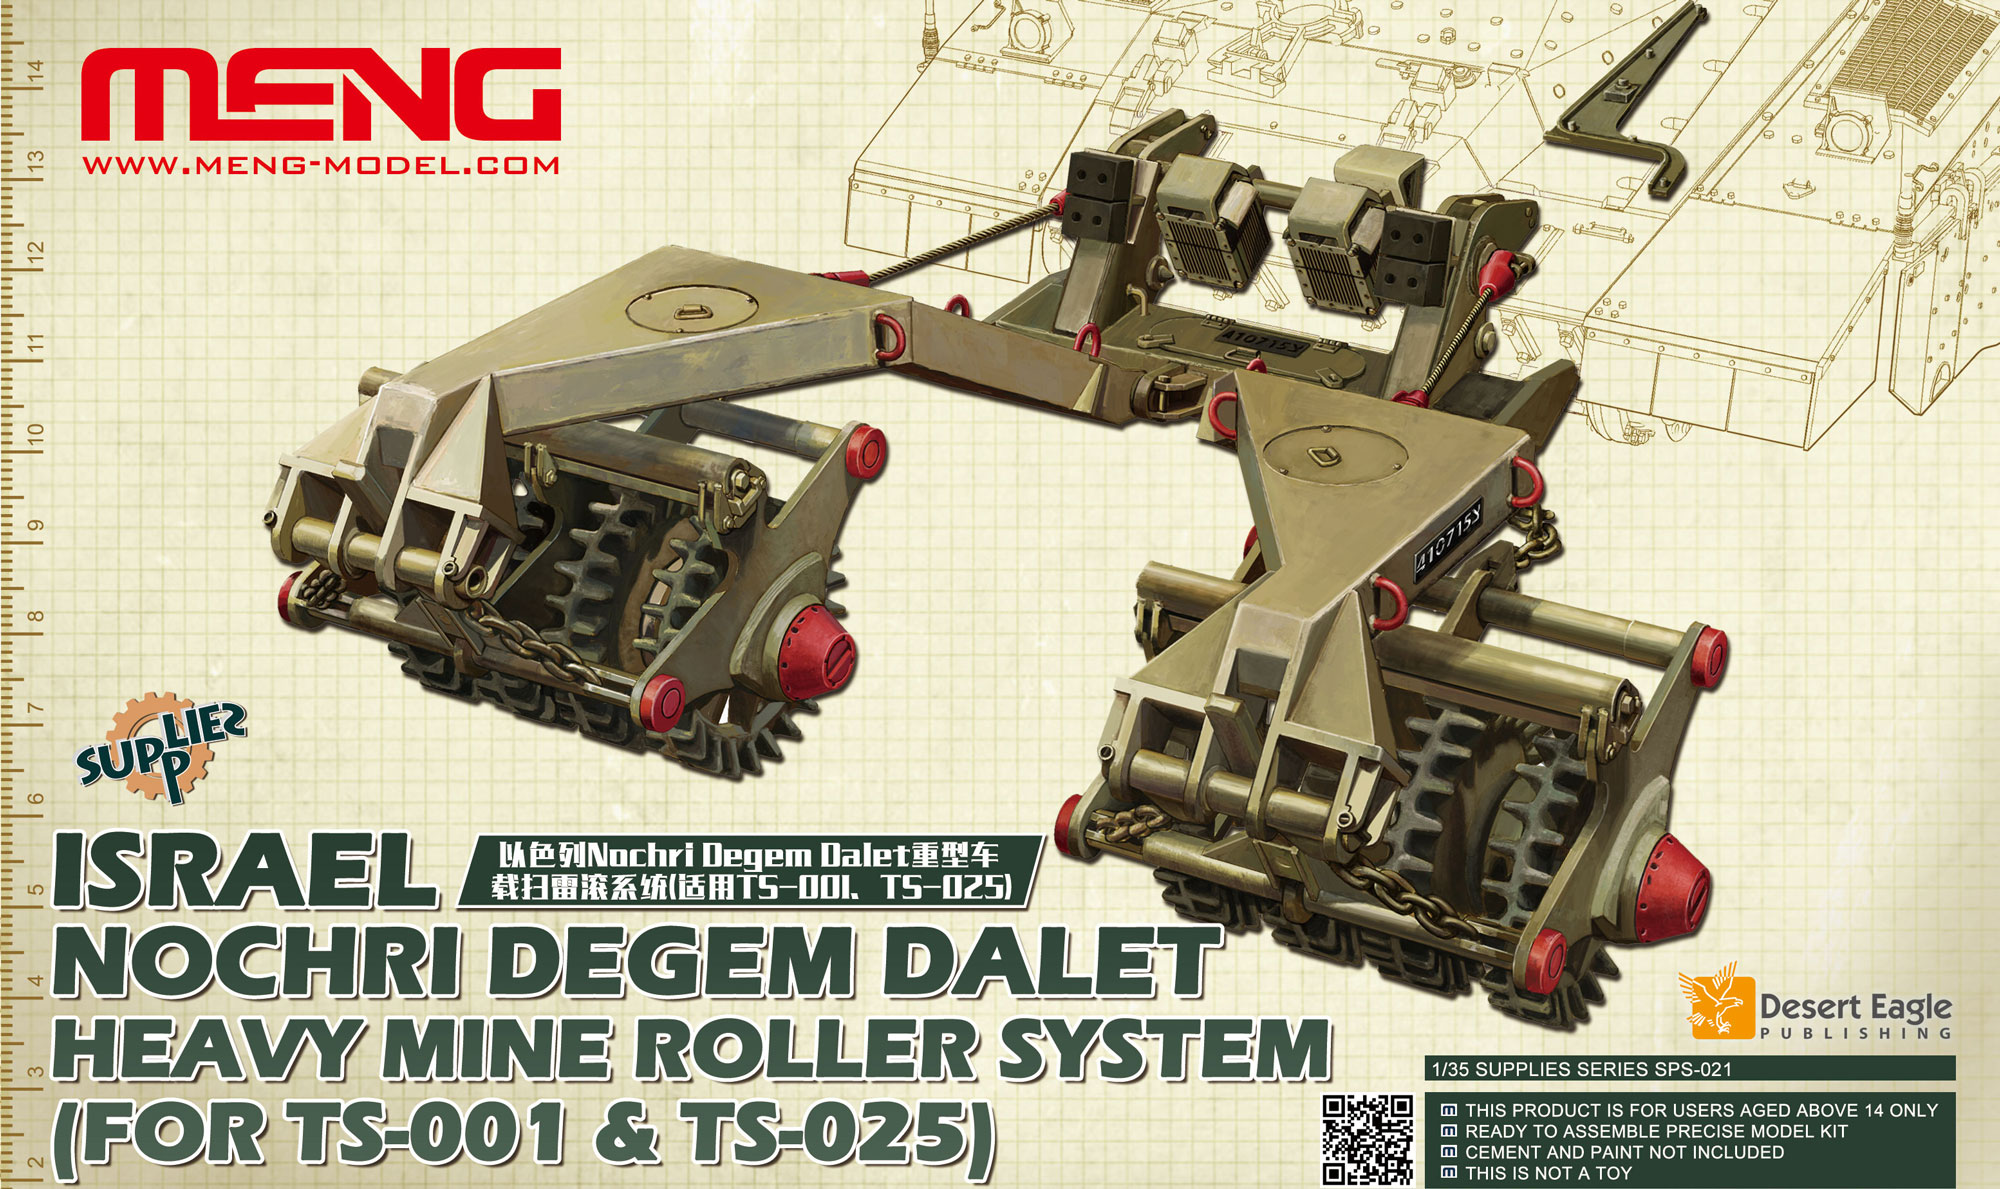 Meng 1/35 Israel Nochri Degem Dalet Heavy Mine Roller System (For TS-001&TS-025)